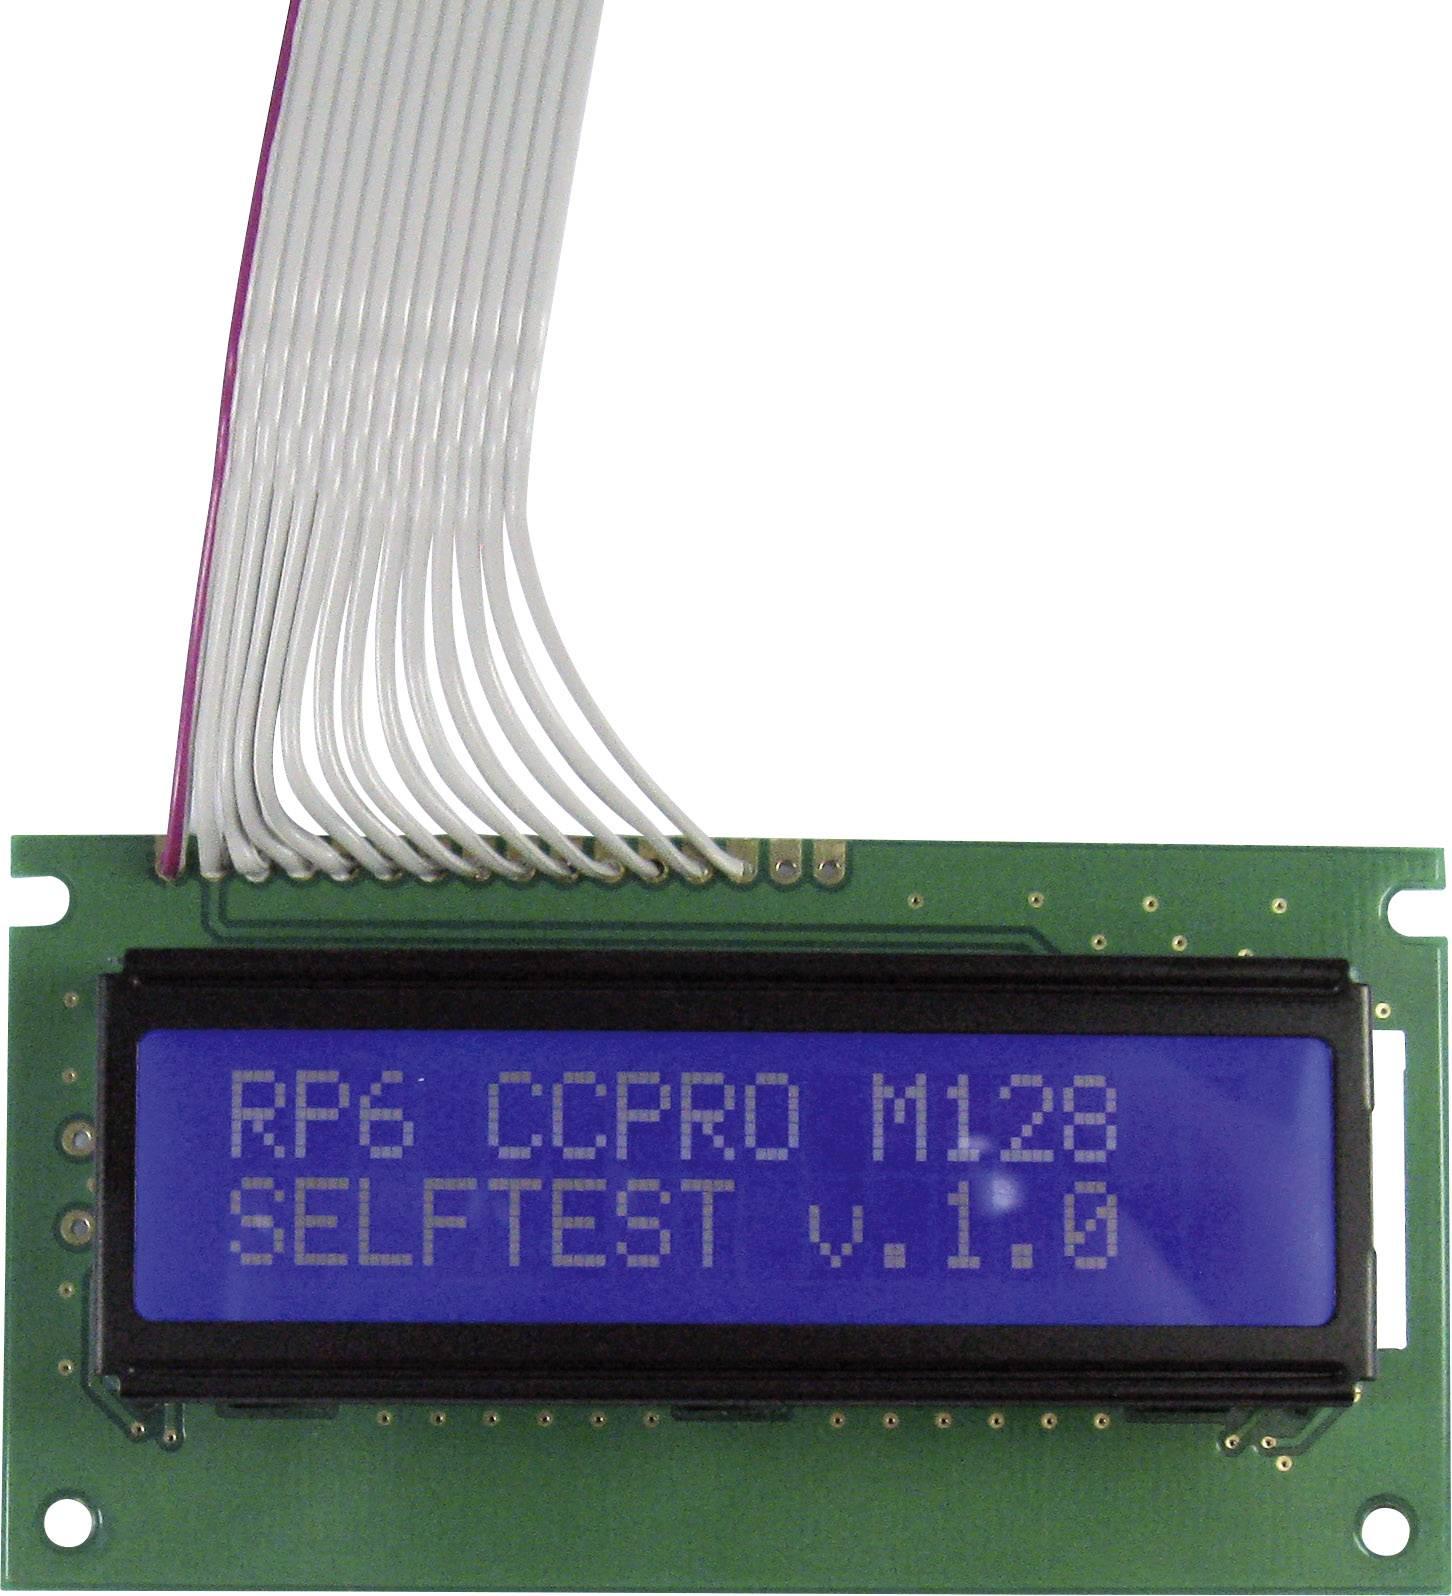 Displej pro robota C Control RP6